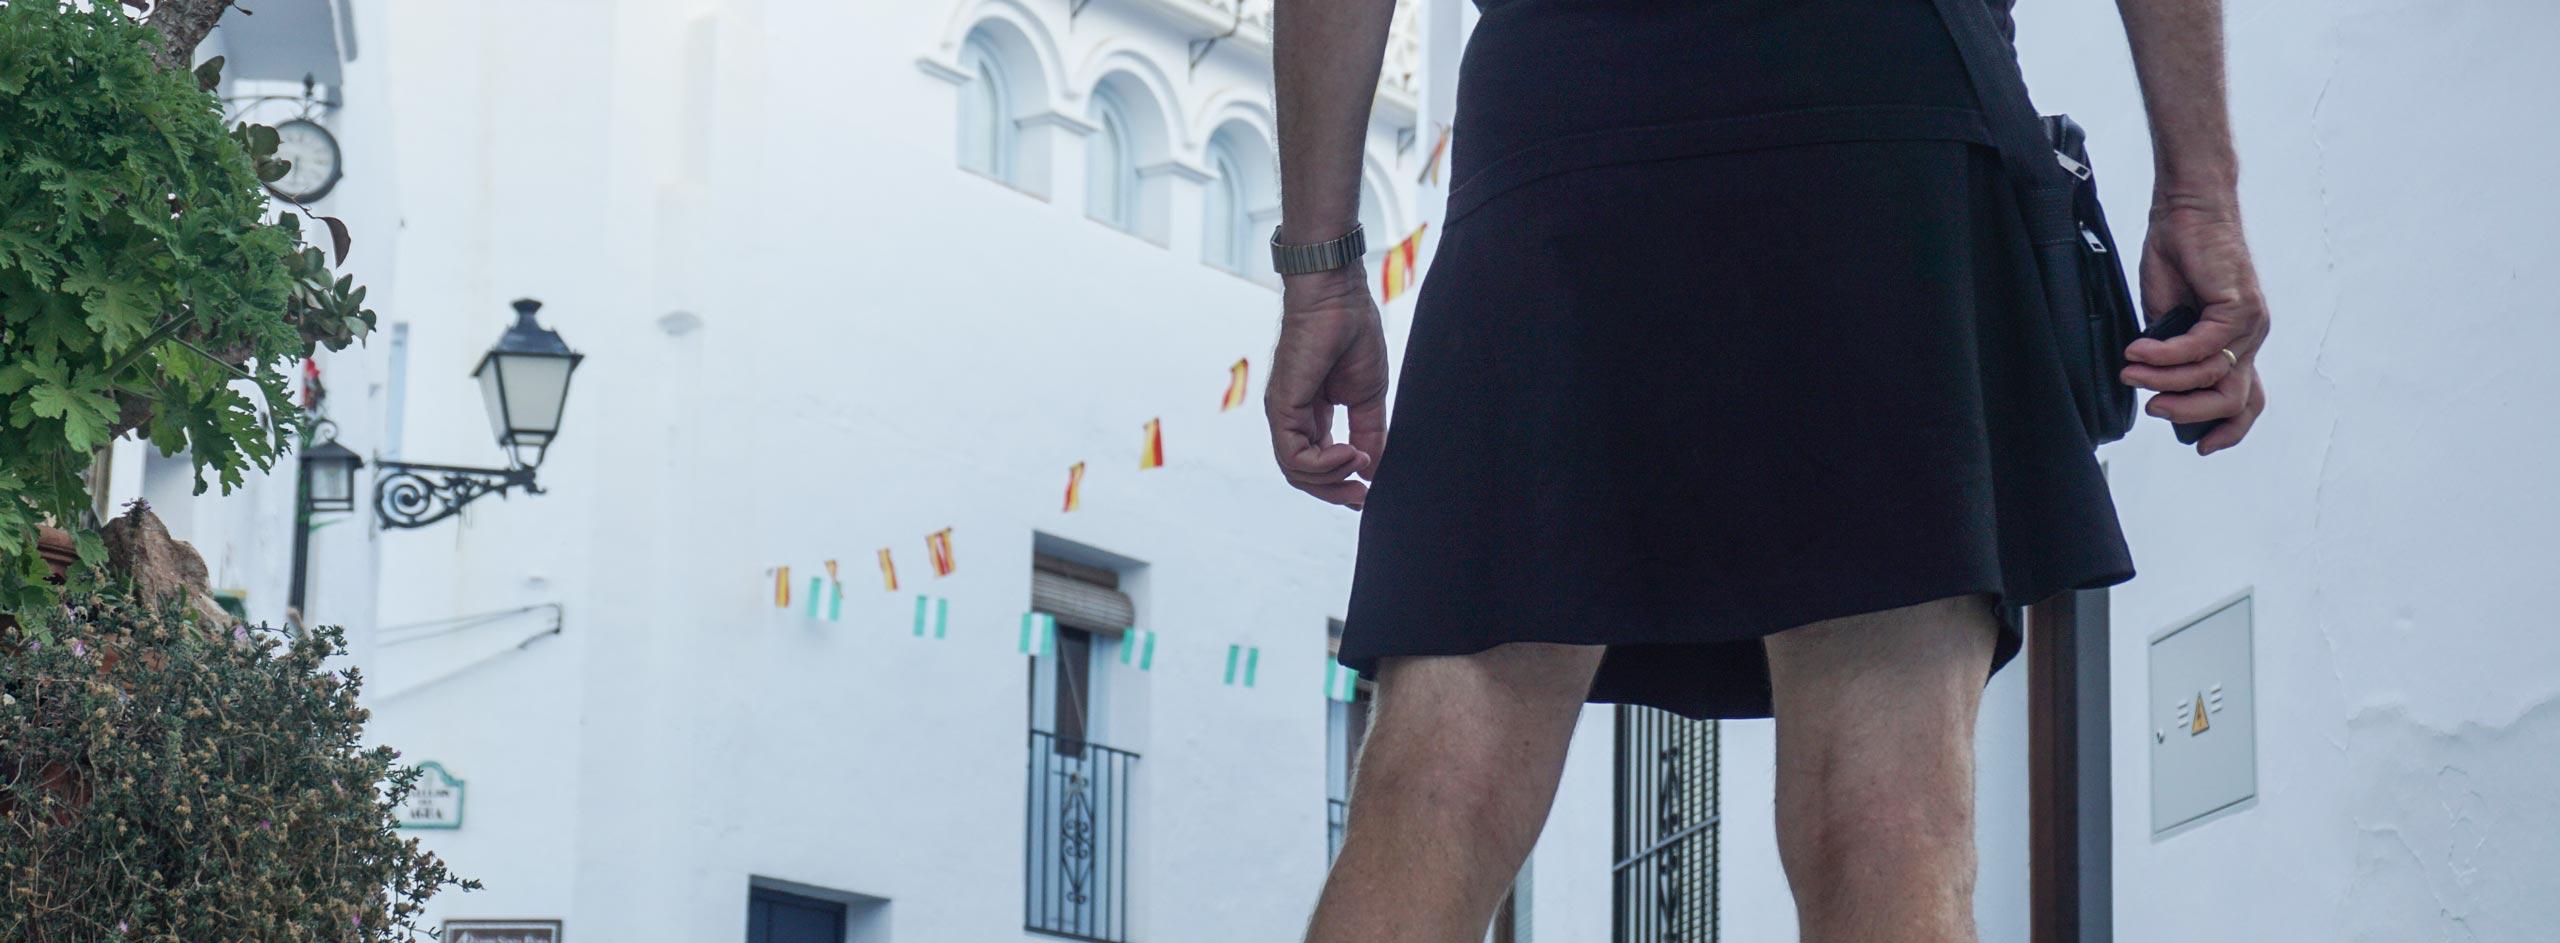 Röcke tragen müssen männer Männer brauchen